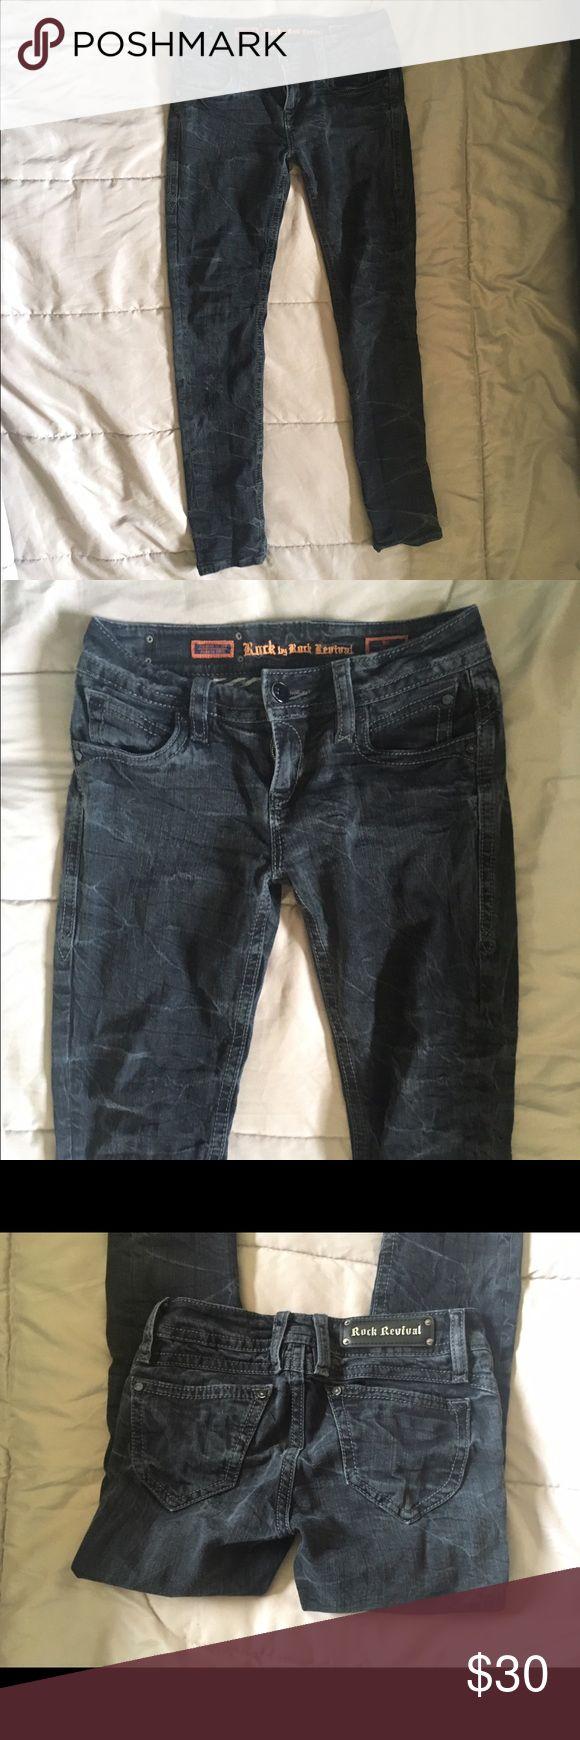 Rock revival 27 skinny jeans Rock revival 27 skinny jeans Rock Revival Jeans Skinny